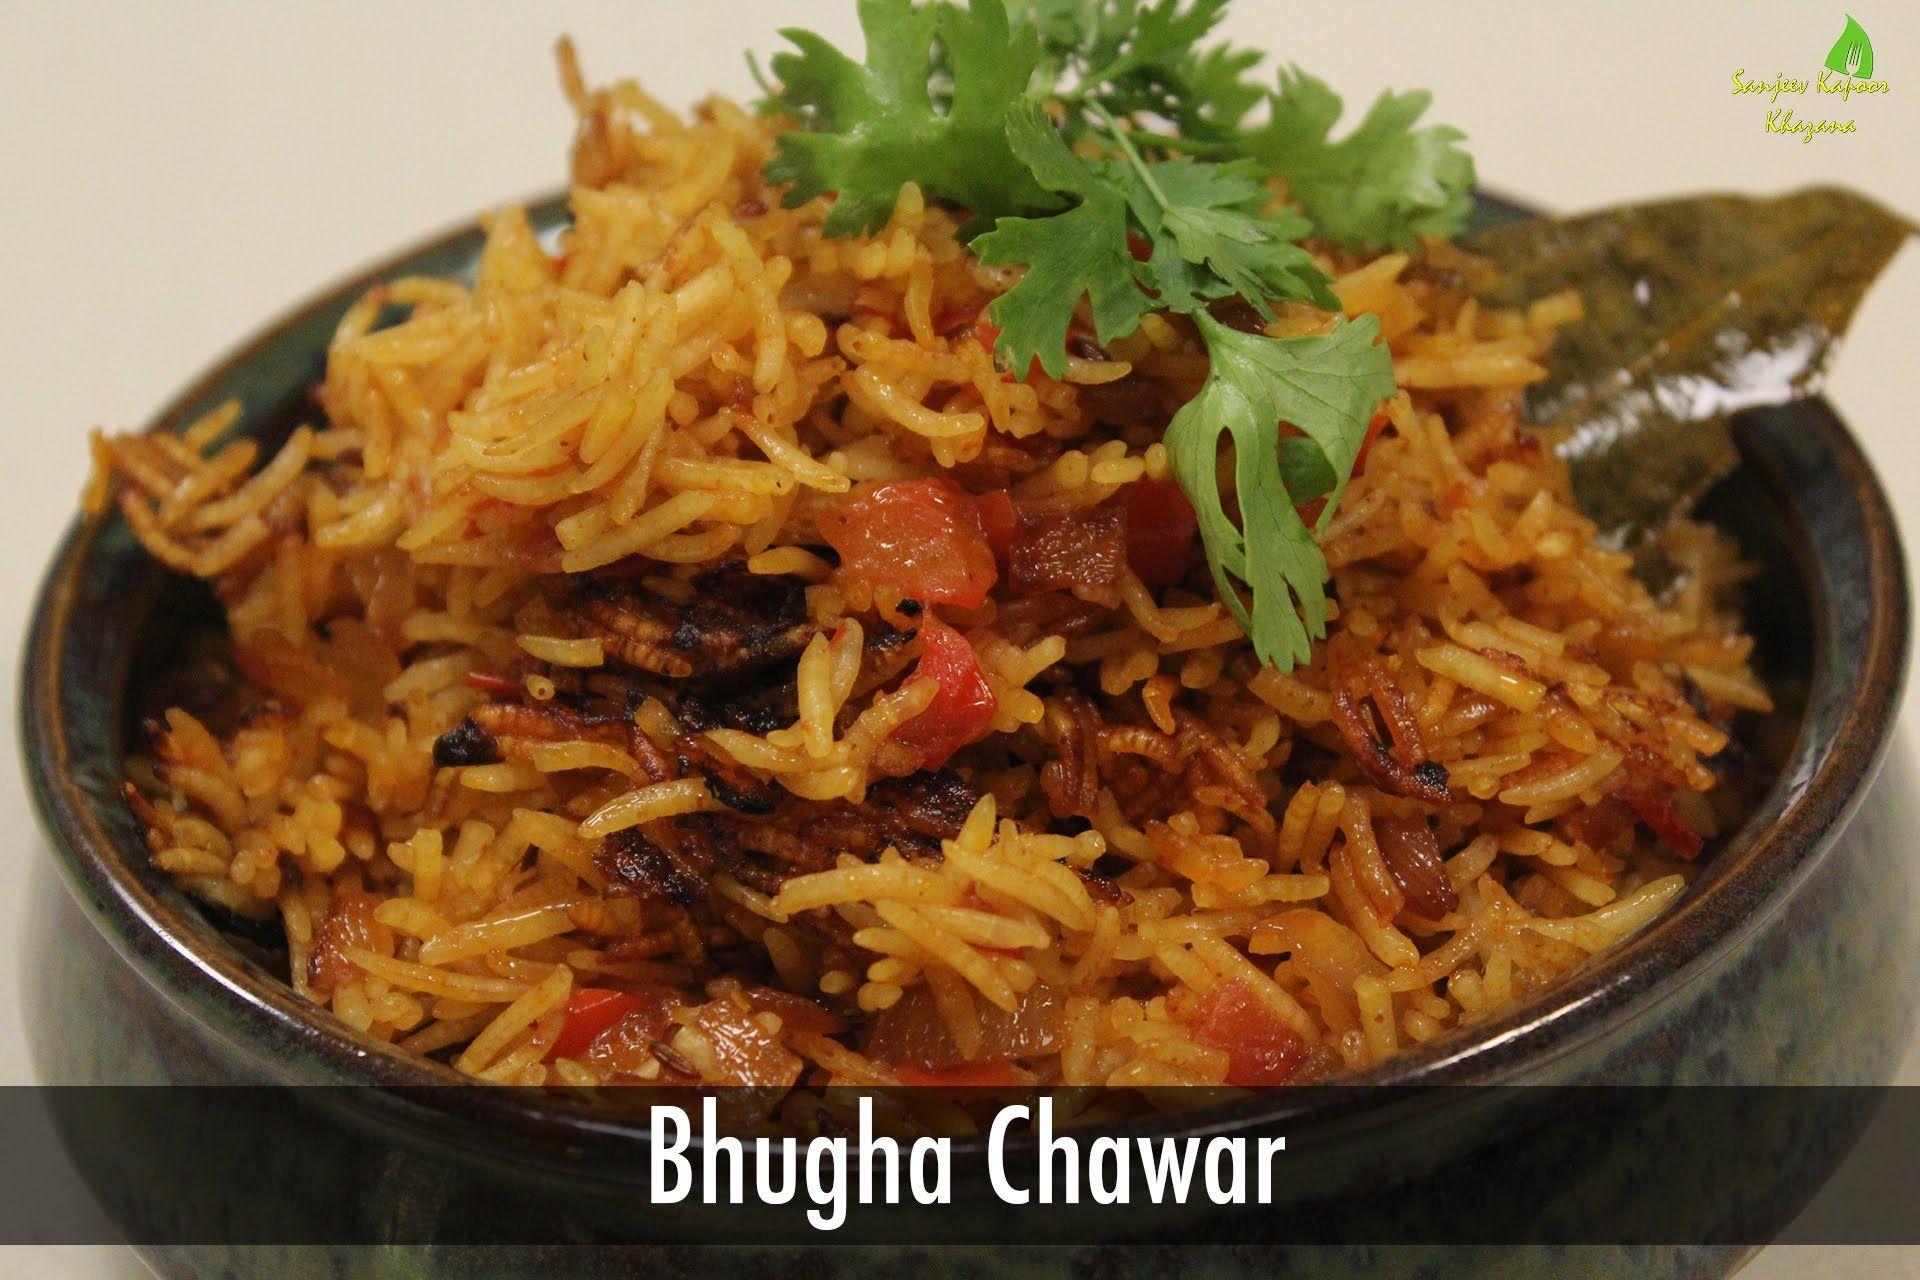 Bhuga chawar simple recipes sanjeev kapoors khana khazana bhuga chawar simple recipes sanjeev kapoors khana khazana forumfinder Choice Image